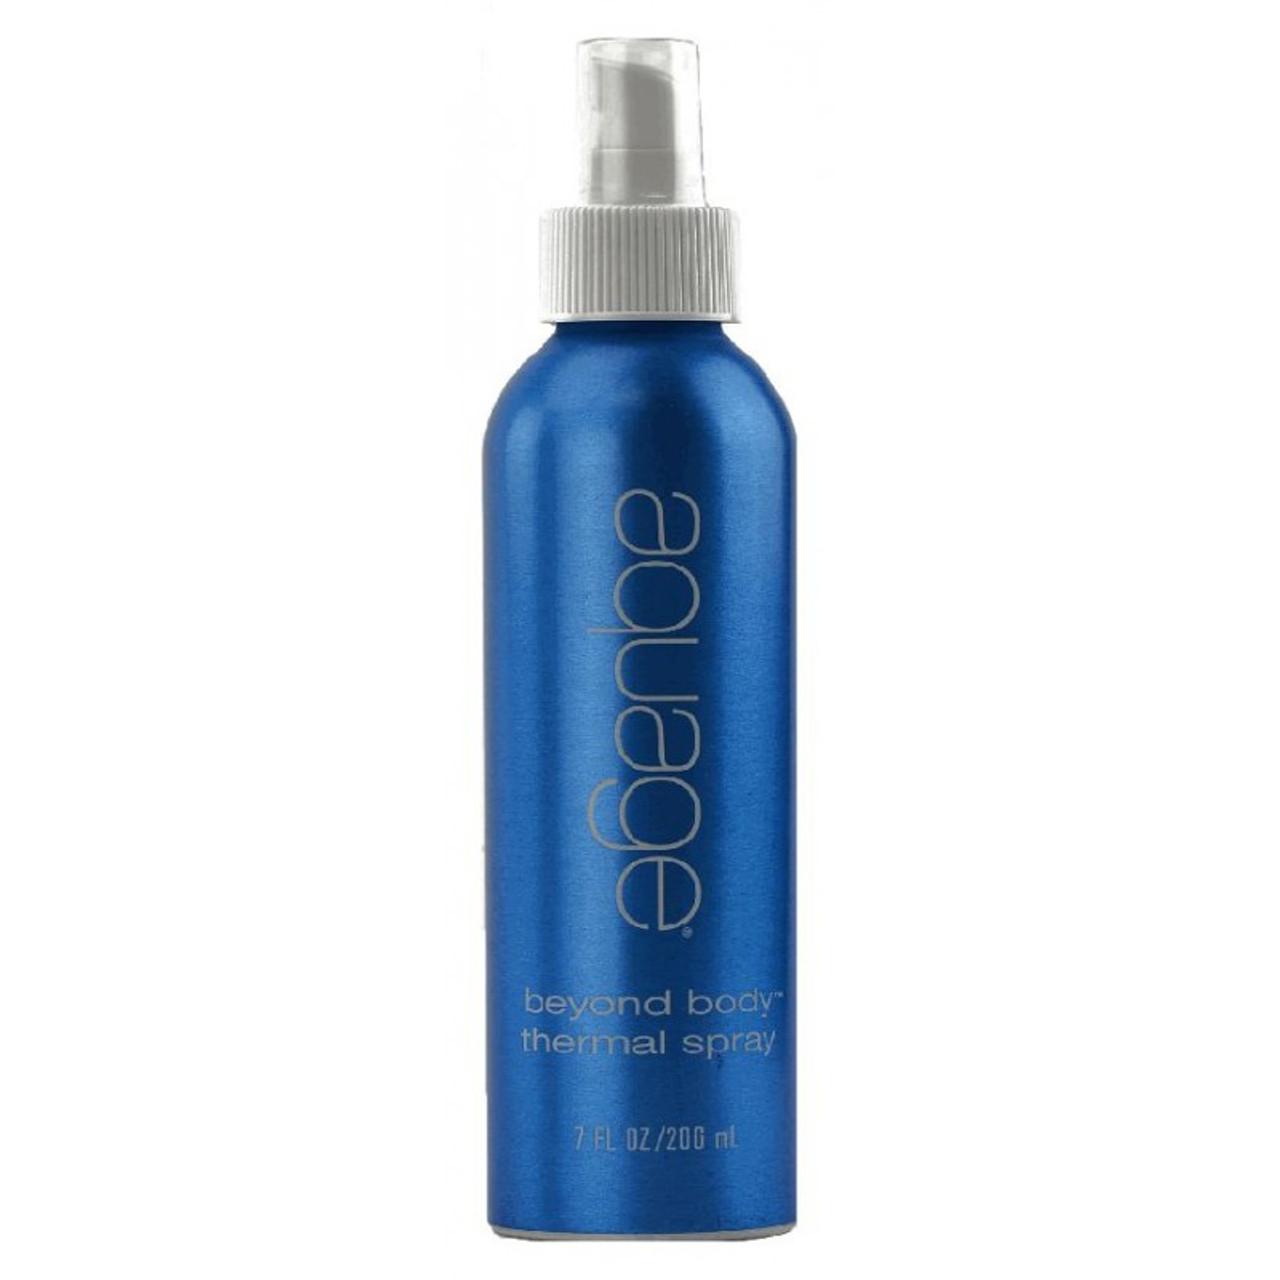 Aquage Beyond Body Sealing Spray, 7 oz